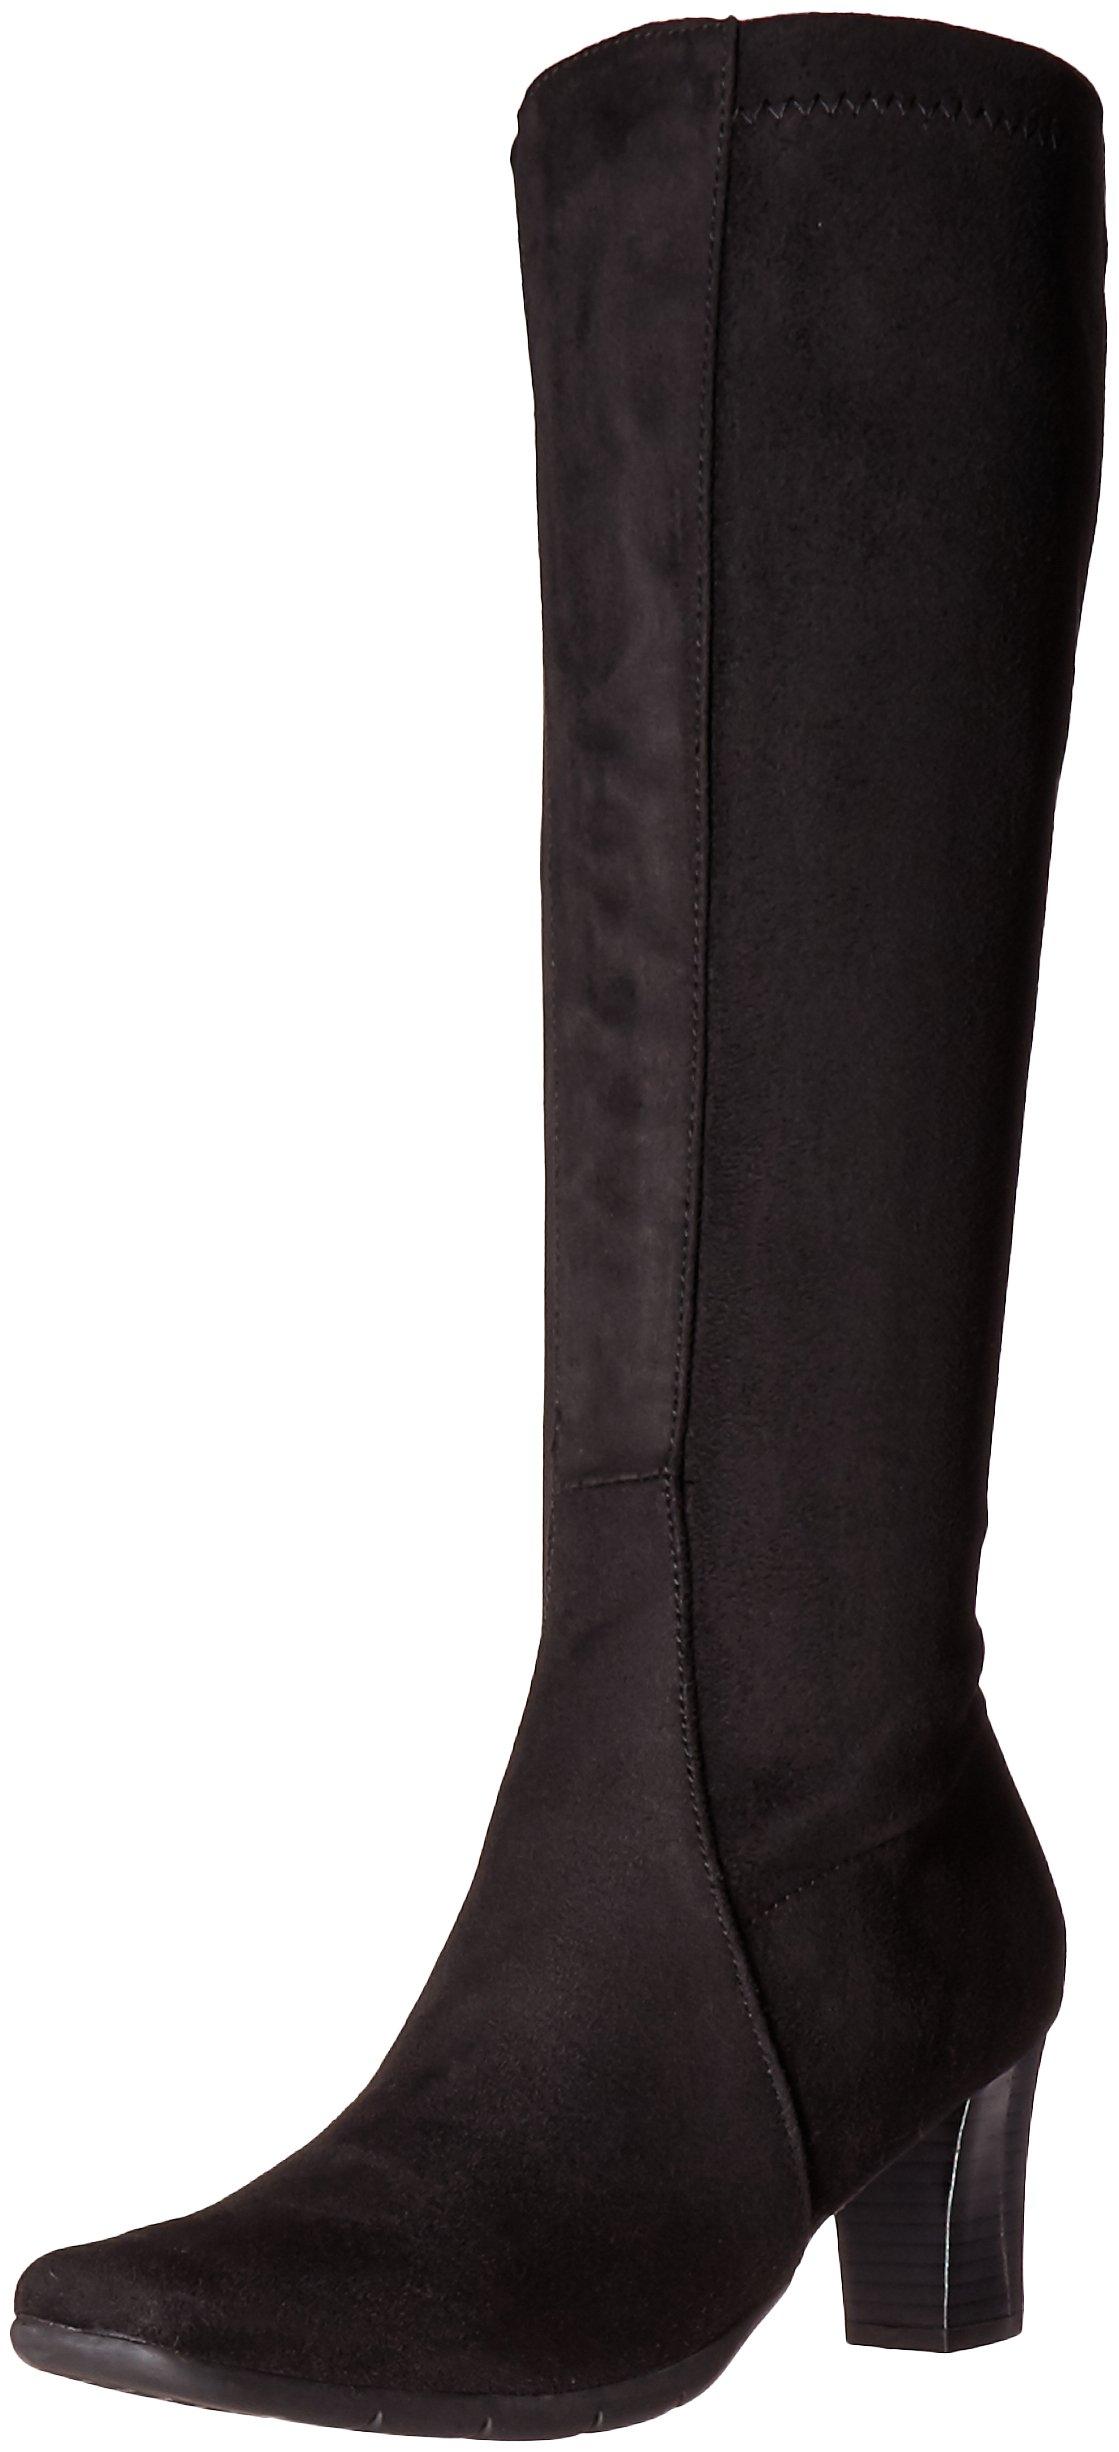 A2 by Aerosoles Women's Lemonade Boot, Black Fabric, 6 M US